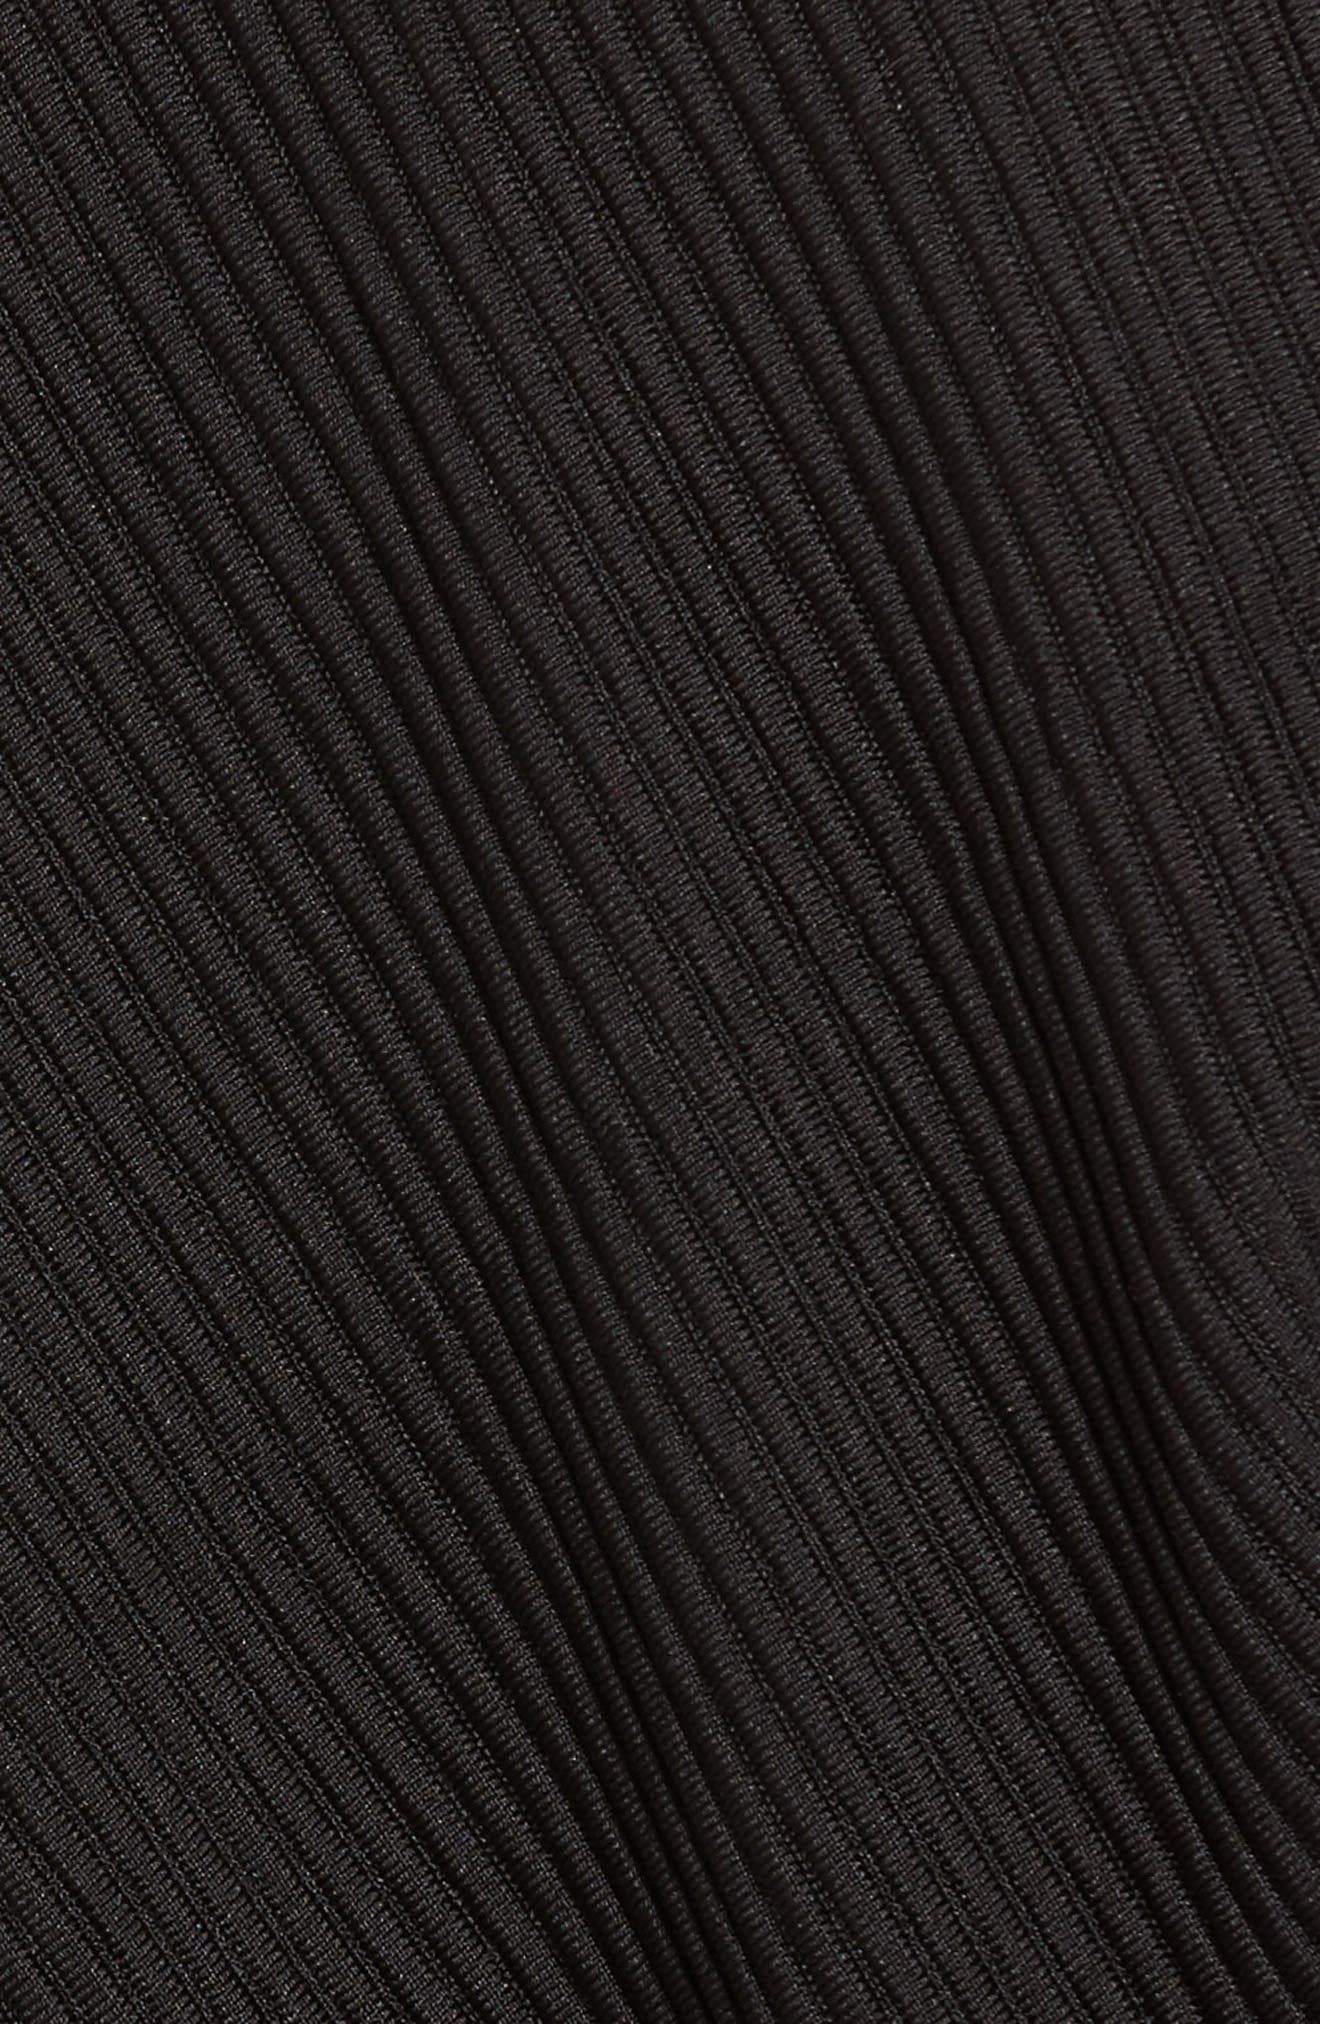 Ribbed Track Jacket,                             Alternate thumbnail 5, color,                             Black